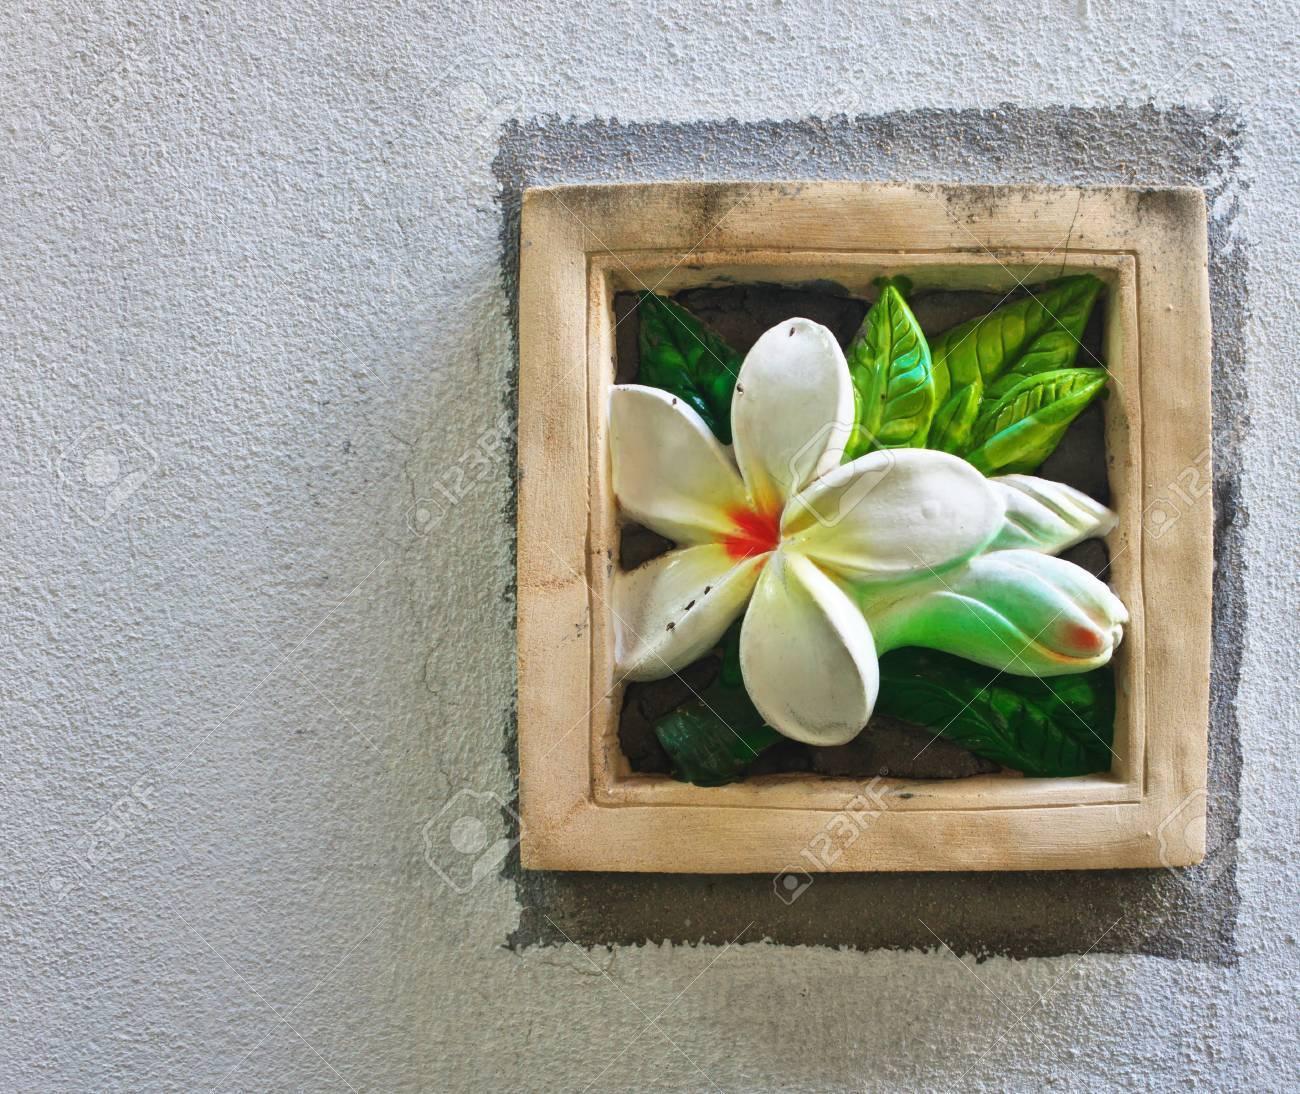 Stone Plumeria Craft Art Design For Spa Stock Photo Picture And